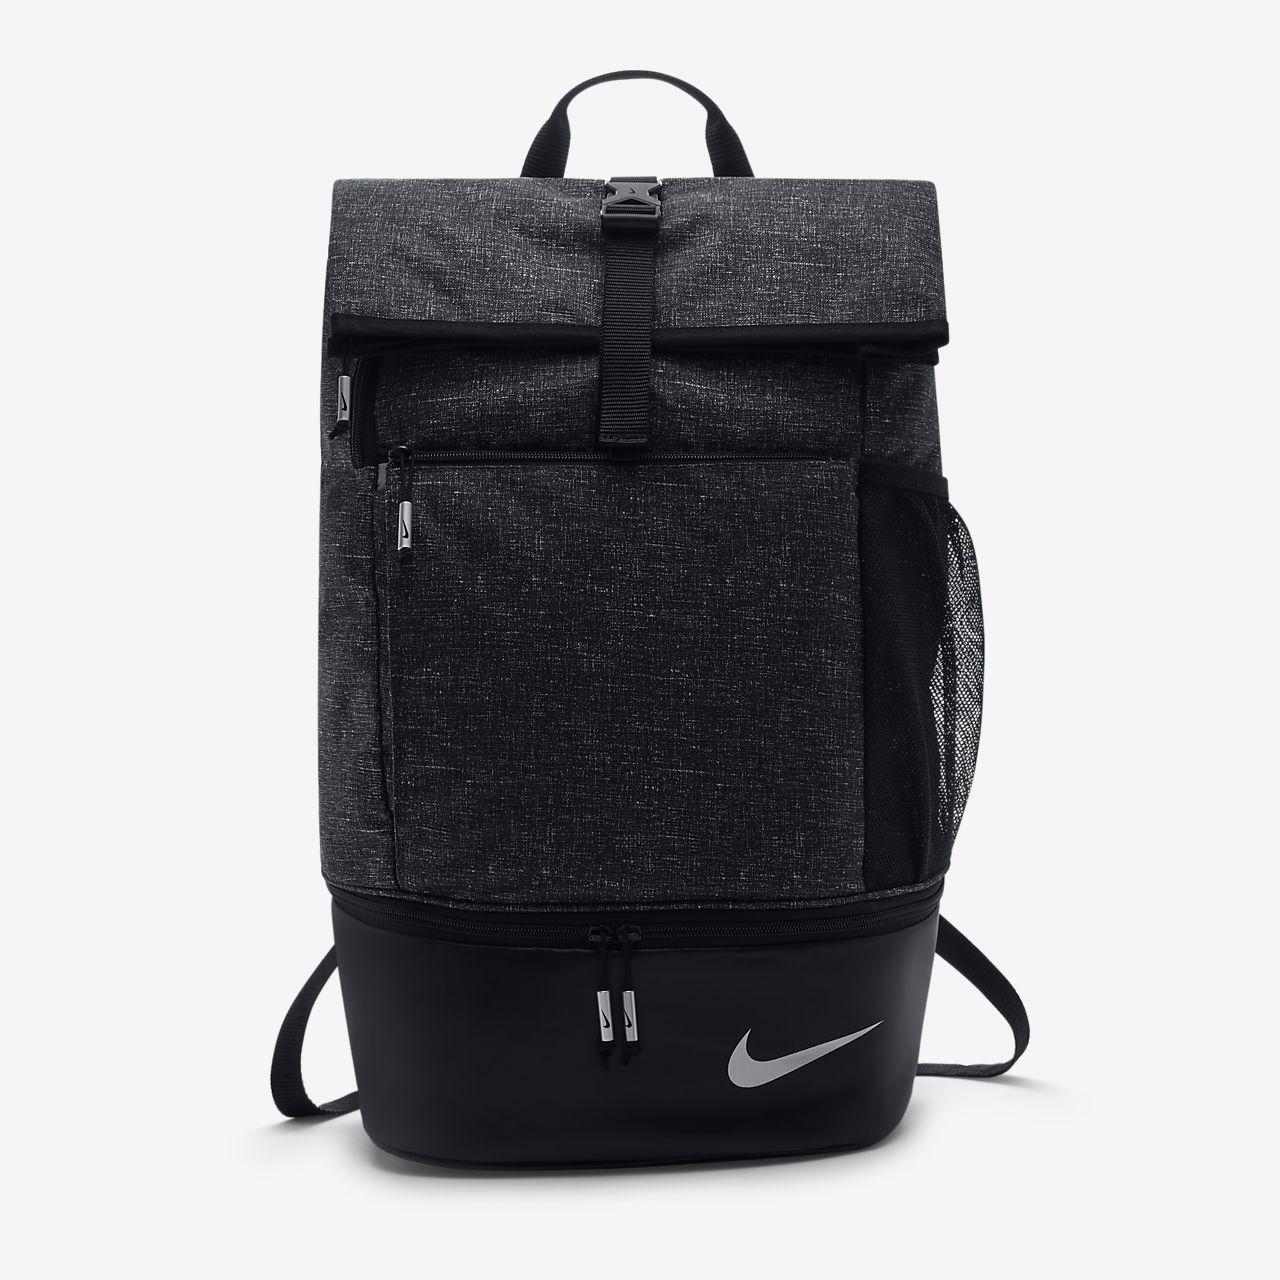 8wtv8qrax Ca Dos Sac Sport Nike À Fq7xw0Xv